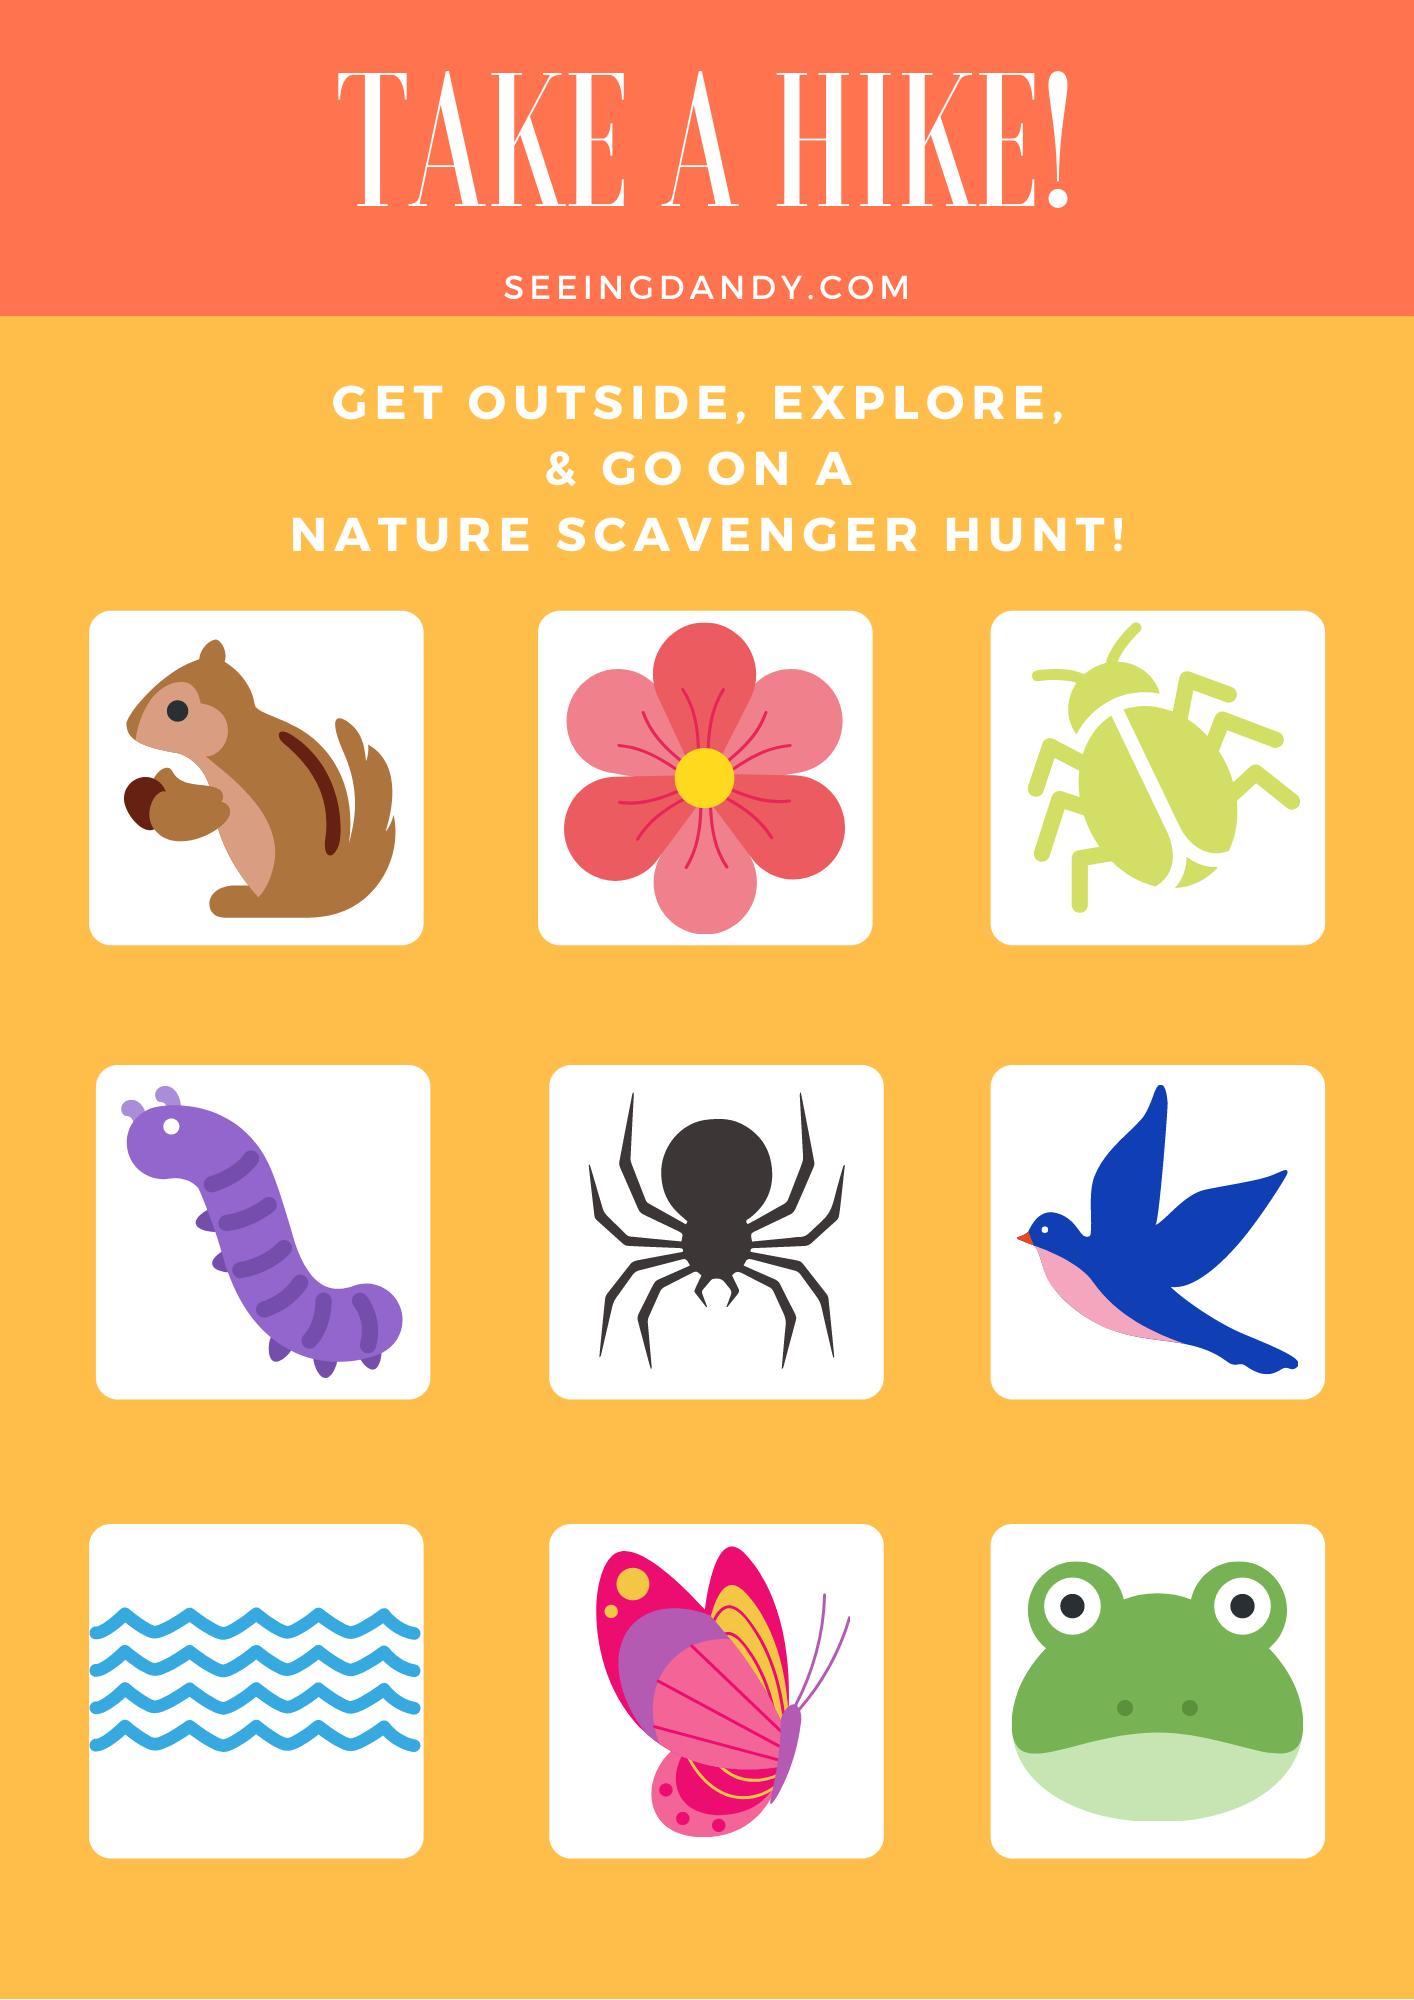 free printable, diy, nature scavenger hunt, hiking scavenger hunt, family fun, hiking adventures, hiking fun, hiking, st. louis, summer fun, free printables